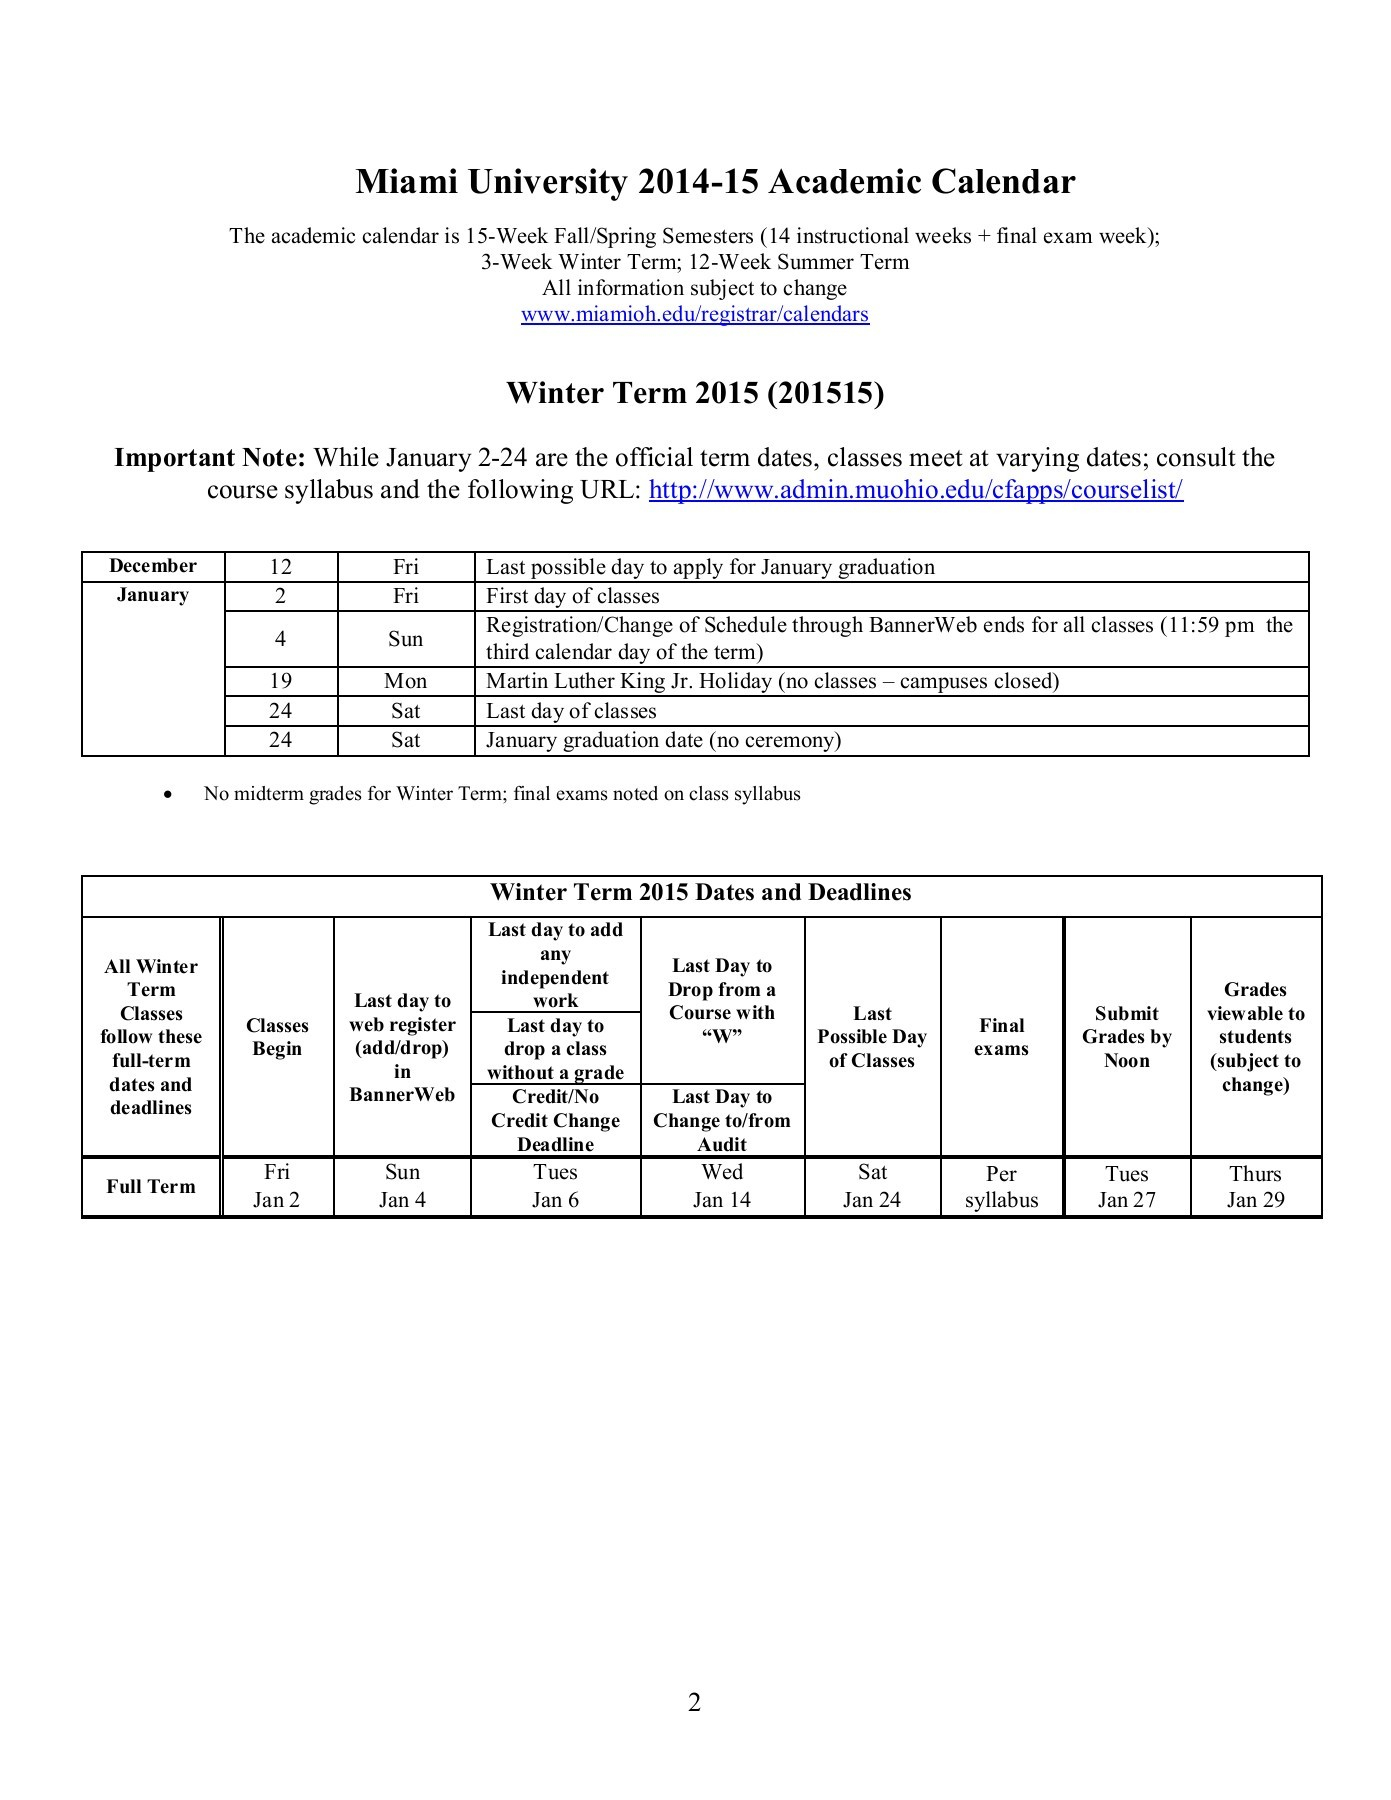 Miami University 2014 15 Academic Calendar Intended For Miami Of Ohio Academic Calendar